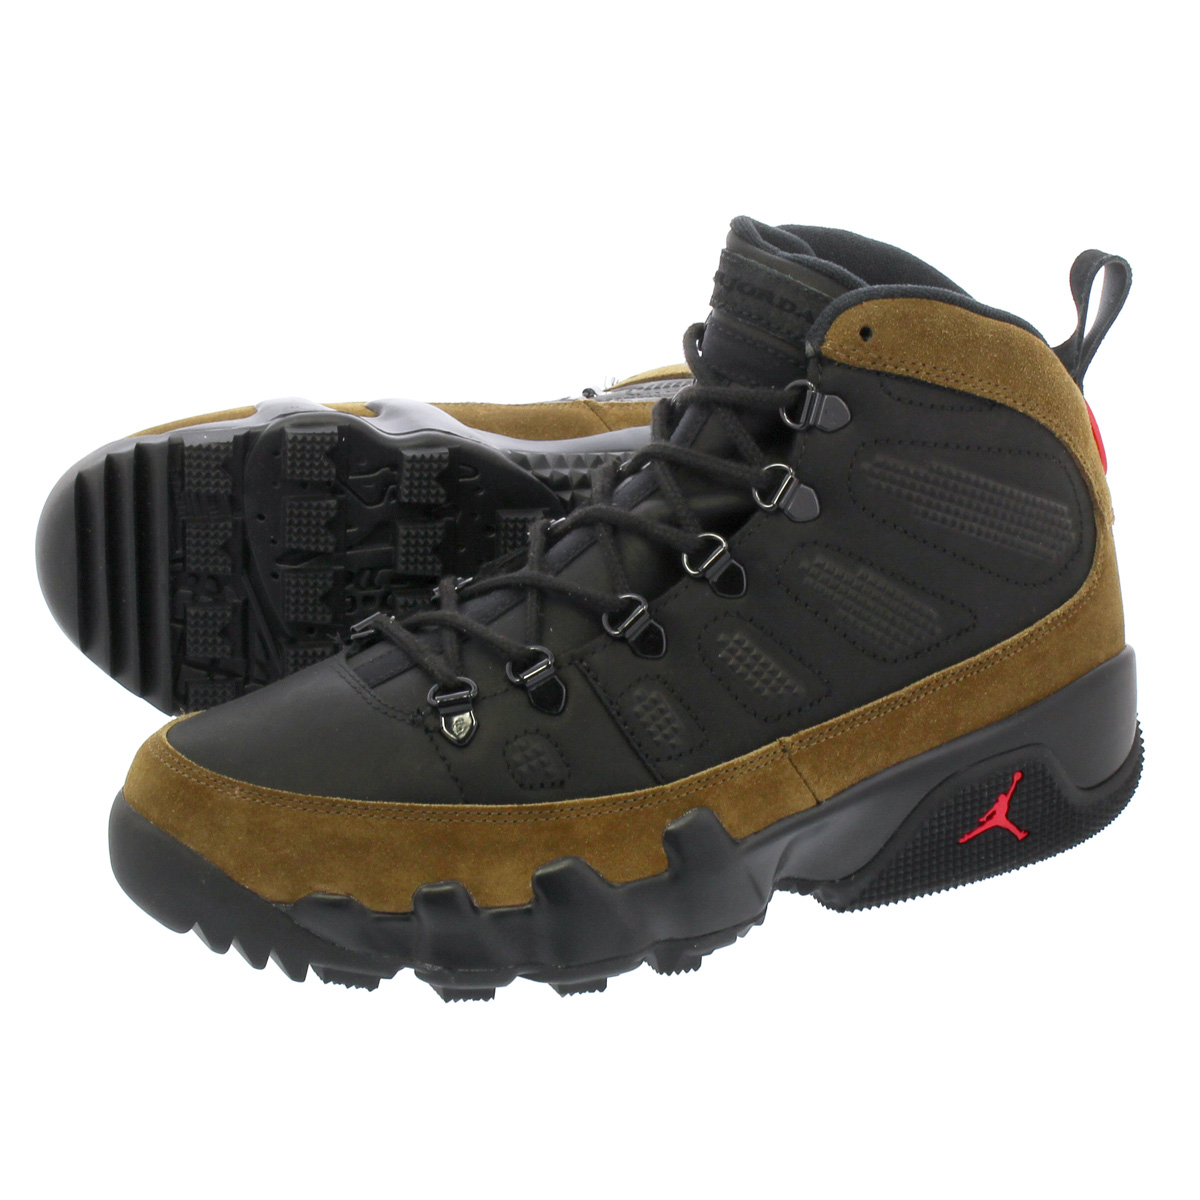 los angeles 29dda 65859 NIKE AIR JORDAN 9 RETRO NRG Nike air Jordan 9 nostalgic NRG BLACK TRUE  RED LIGHT OLIVE